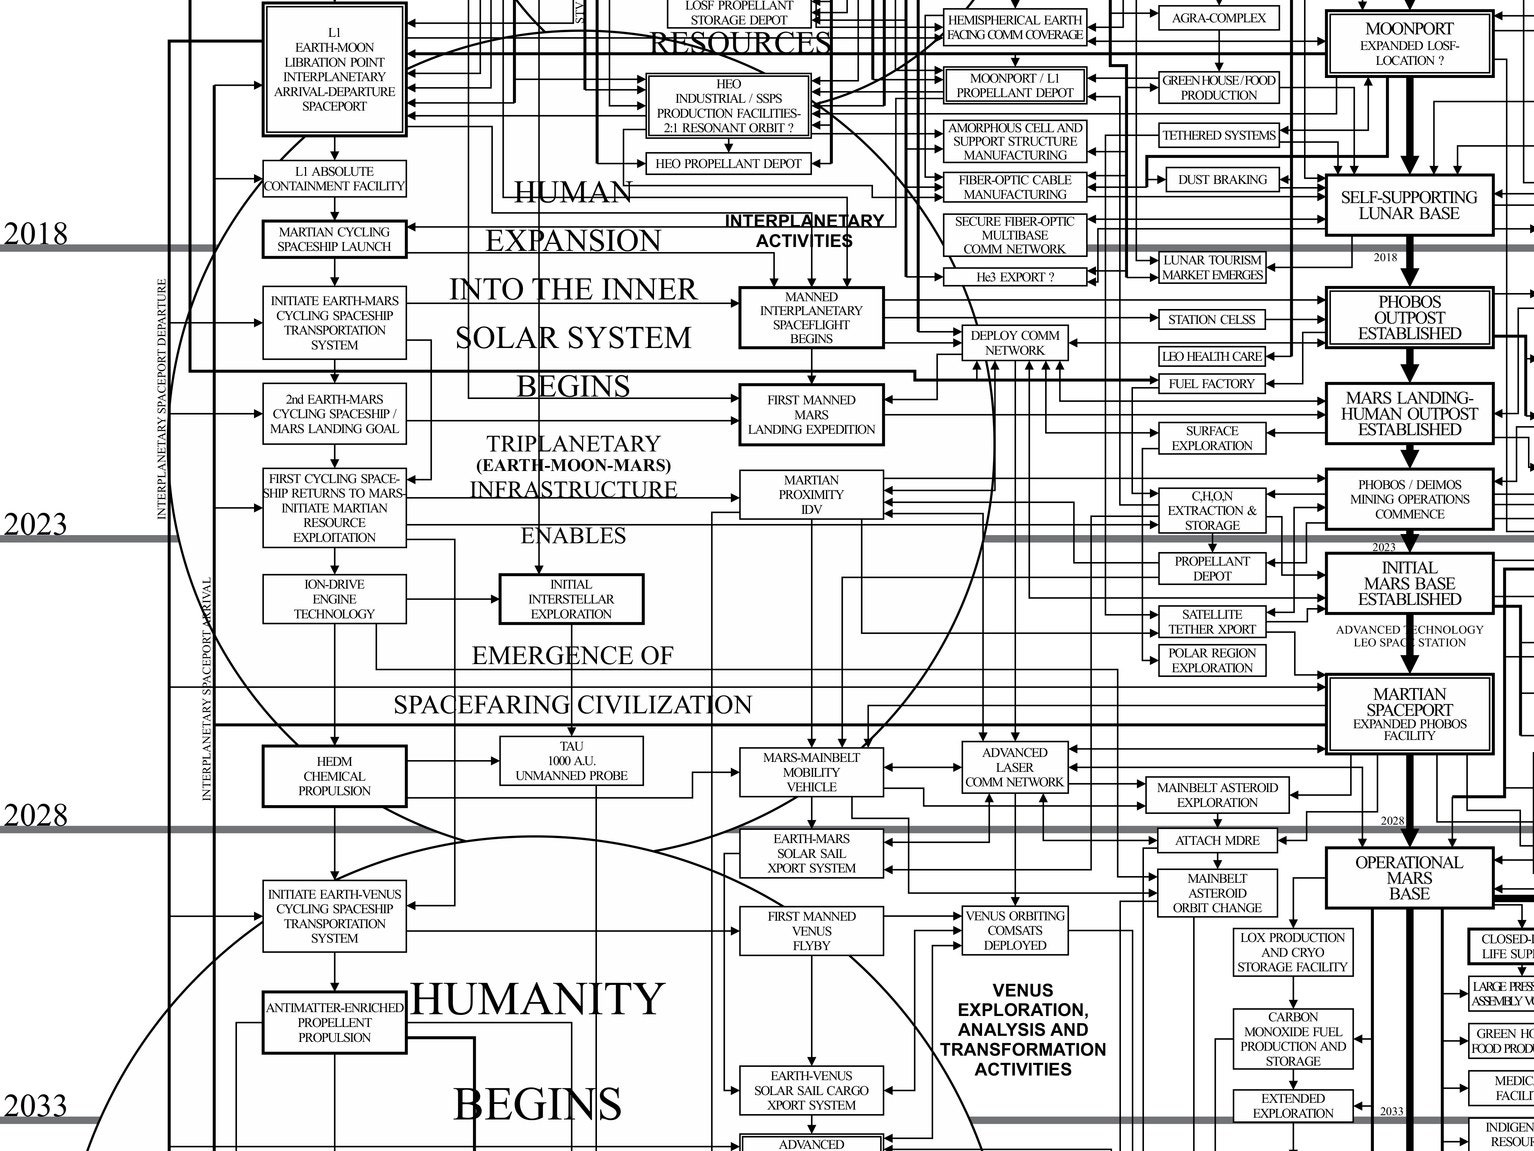 integratedspaceplan 1989 1?resize\\\\\\\=665%2C499\\\\\\\&ssl\\\\\\\=1 1989 chevy truck heater wiring diagram wiring diagrams  at honlapkeszites.co